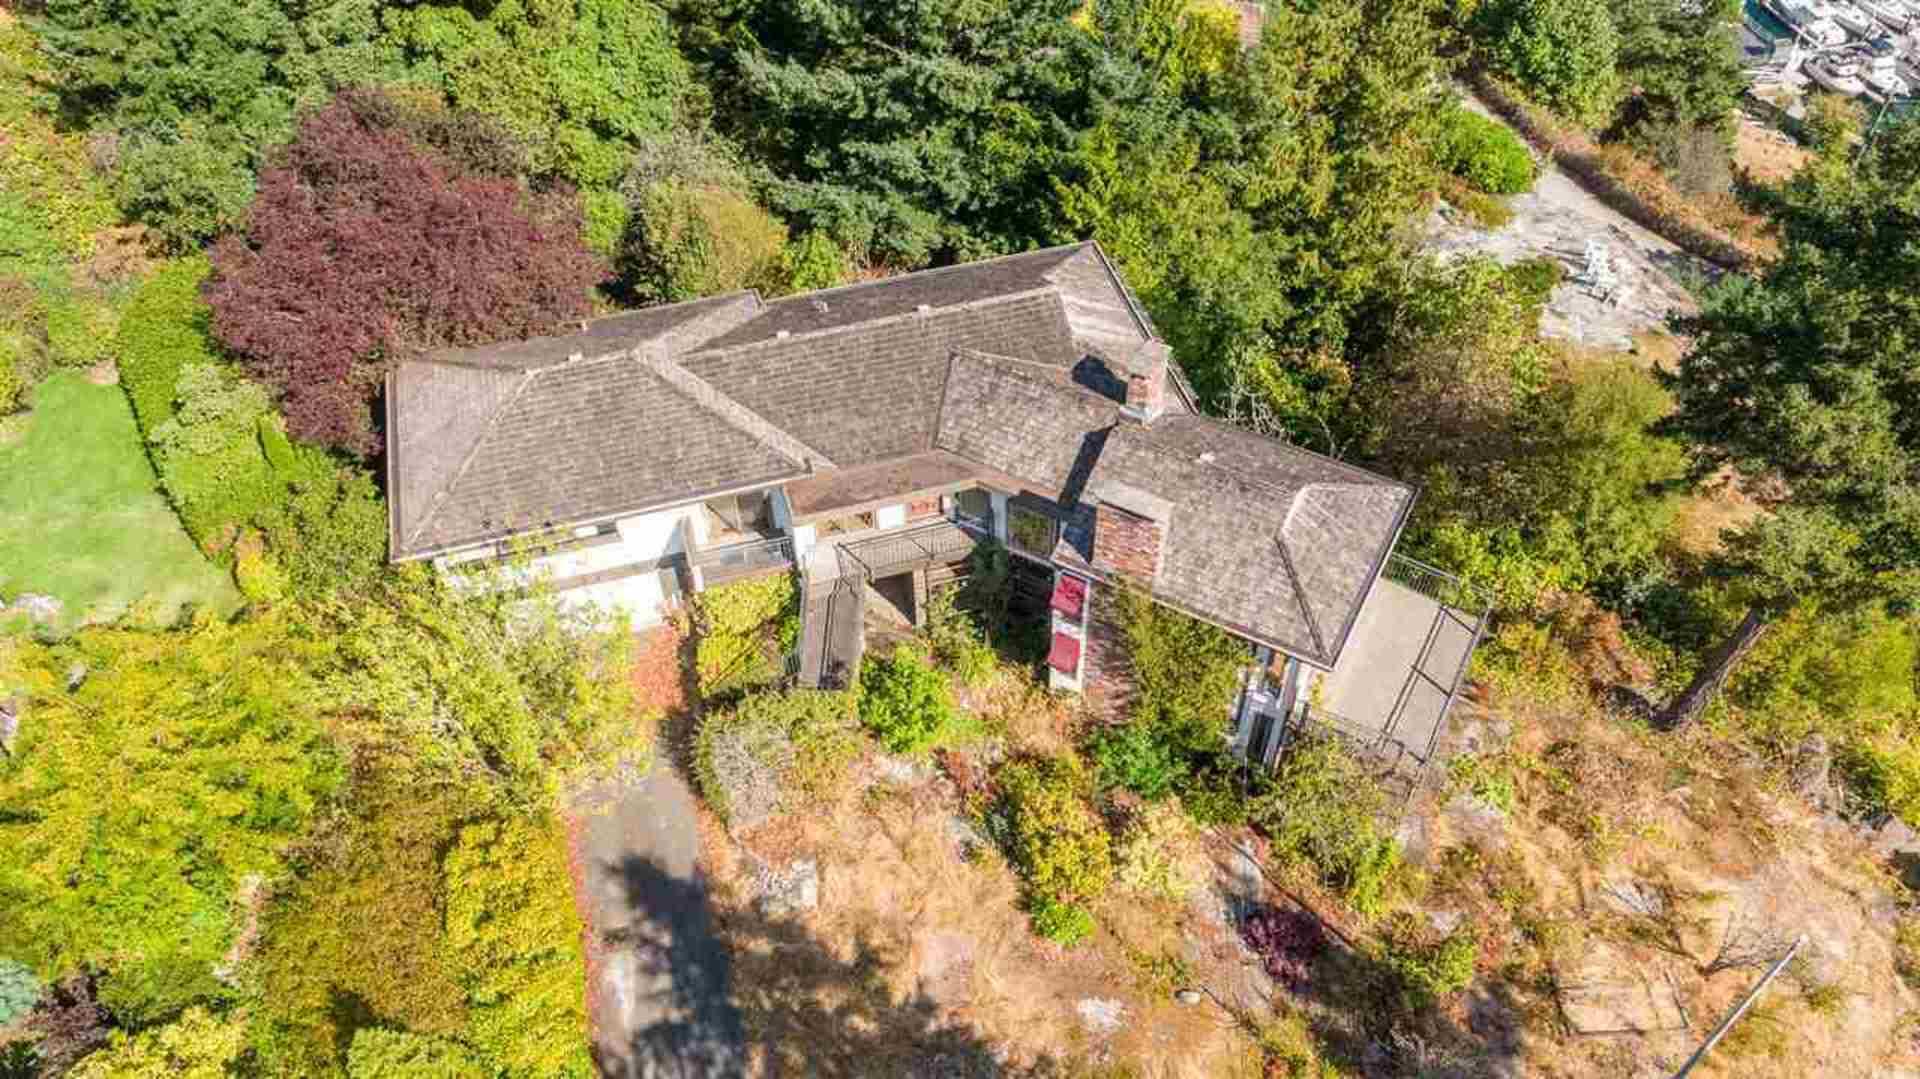 5930-condor-place-eagleridge-west-vancouver-10 at 5930 Condor Place, Eagleridge, West Vancouver